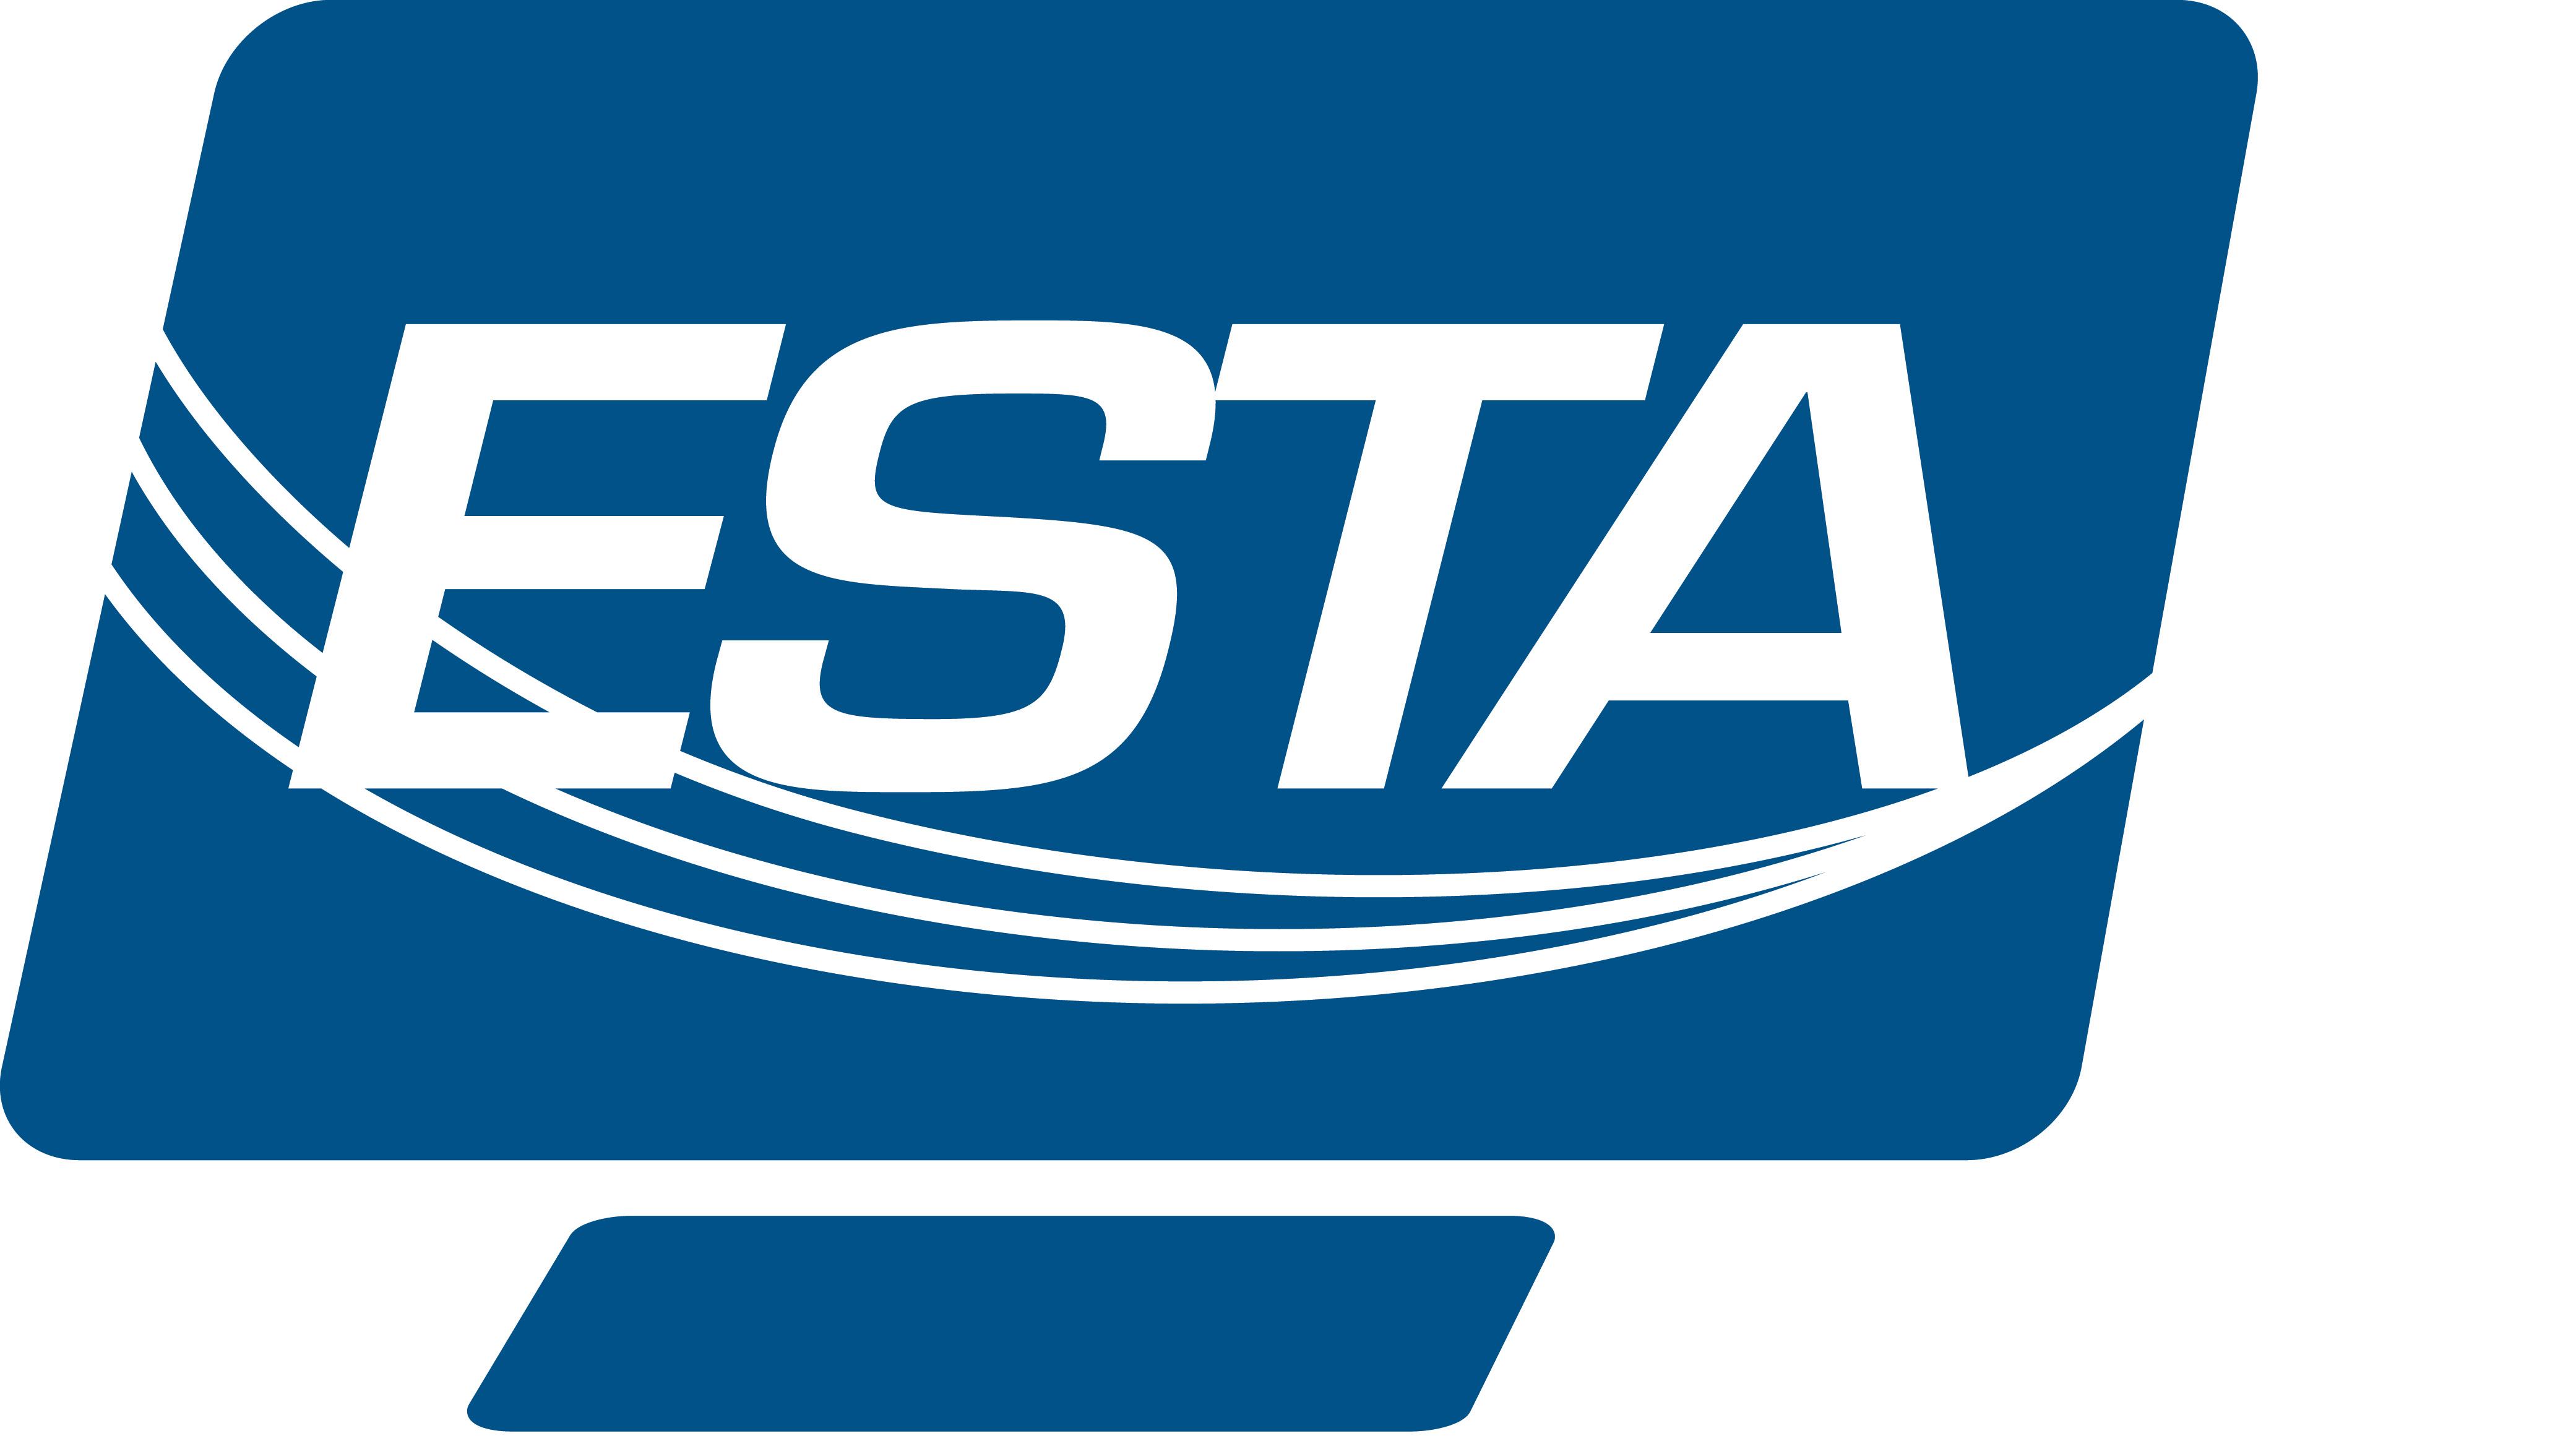 ESTA_16-9